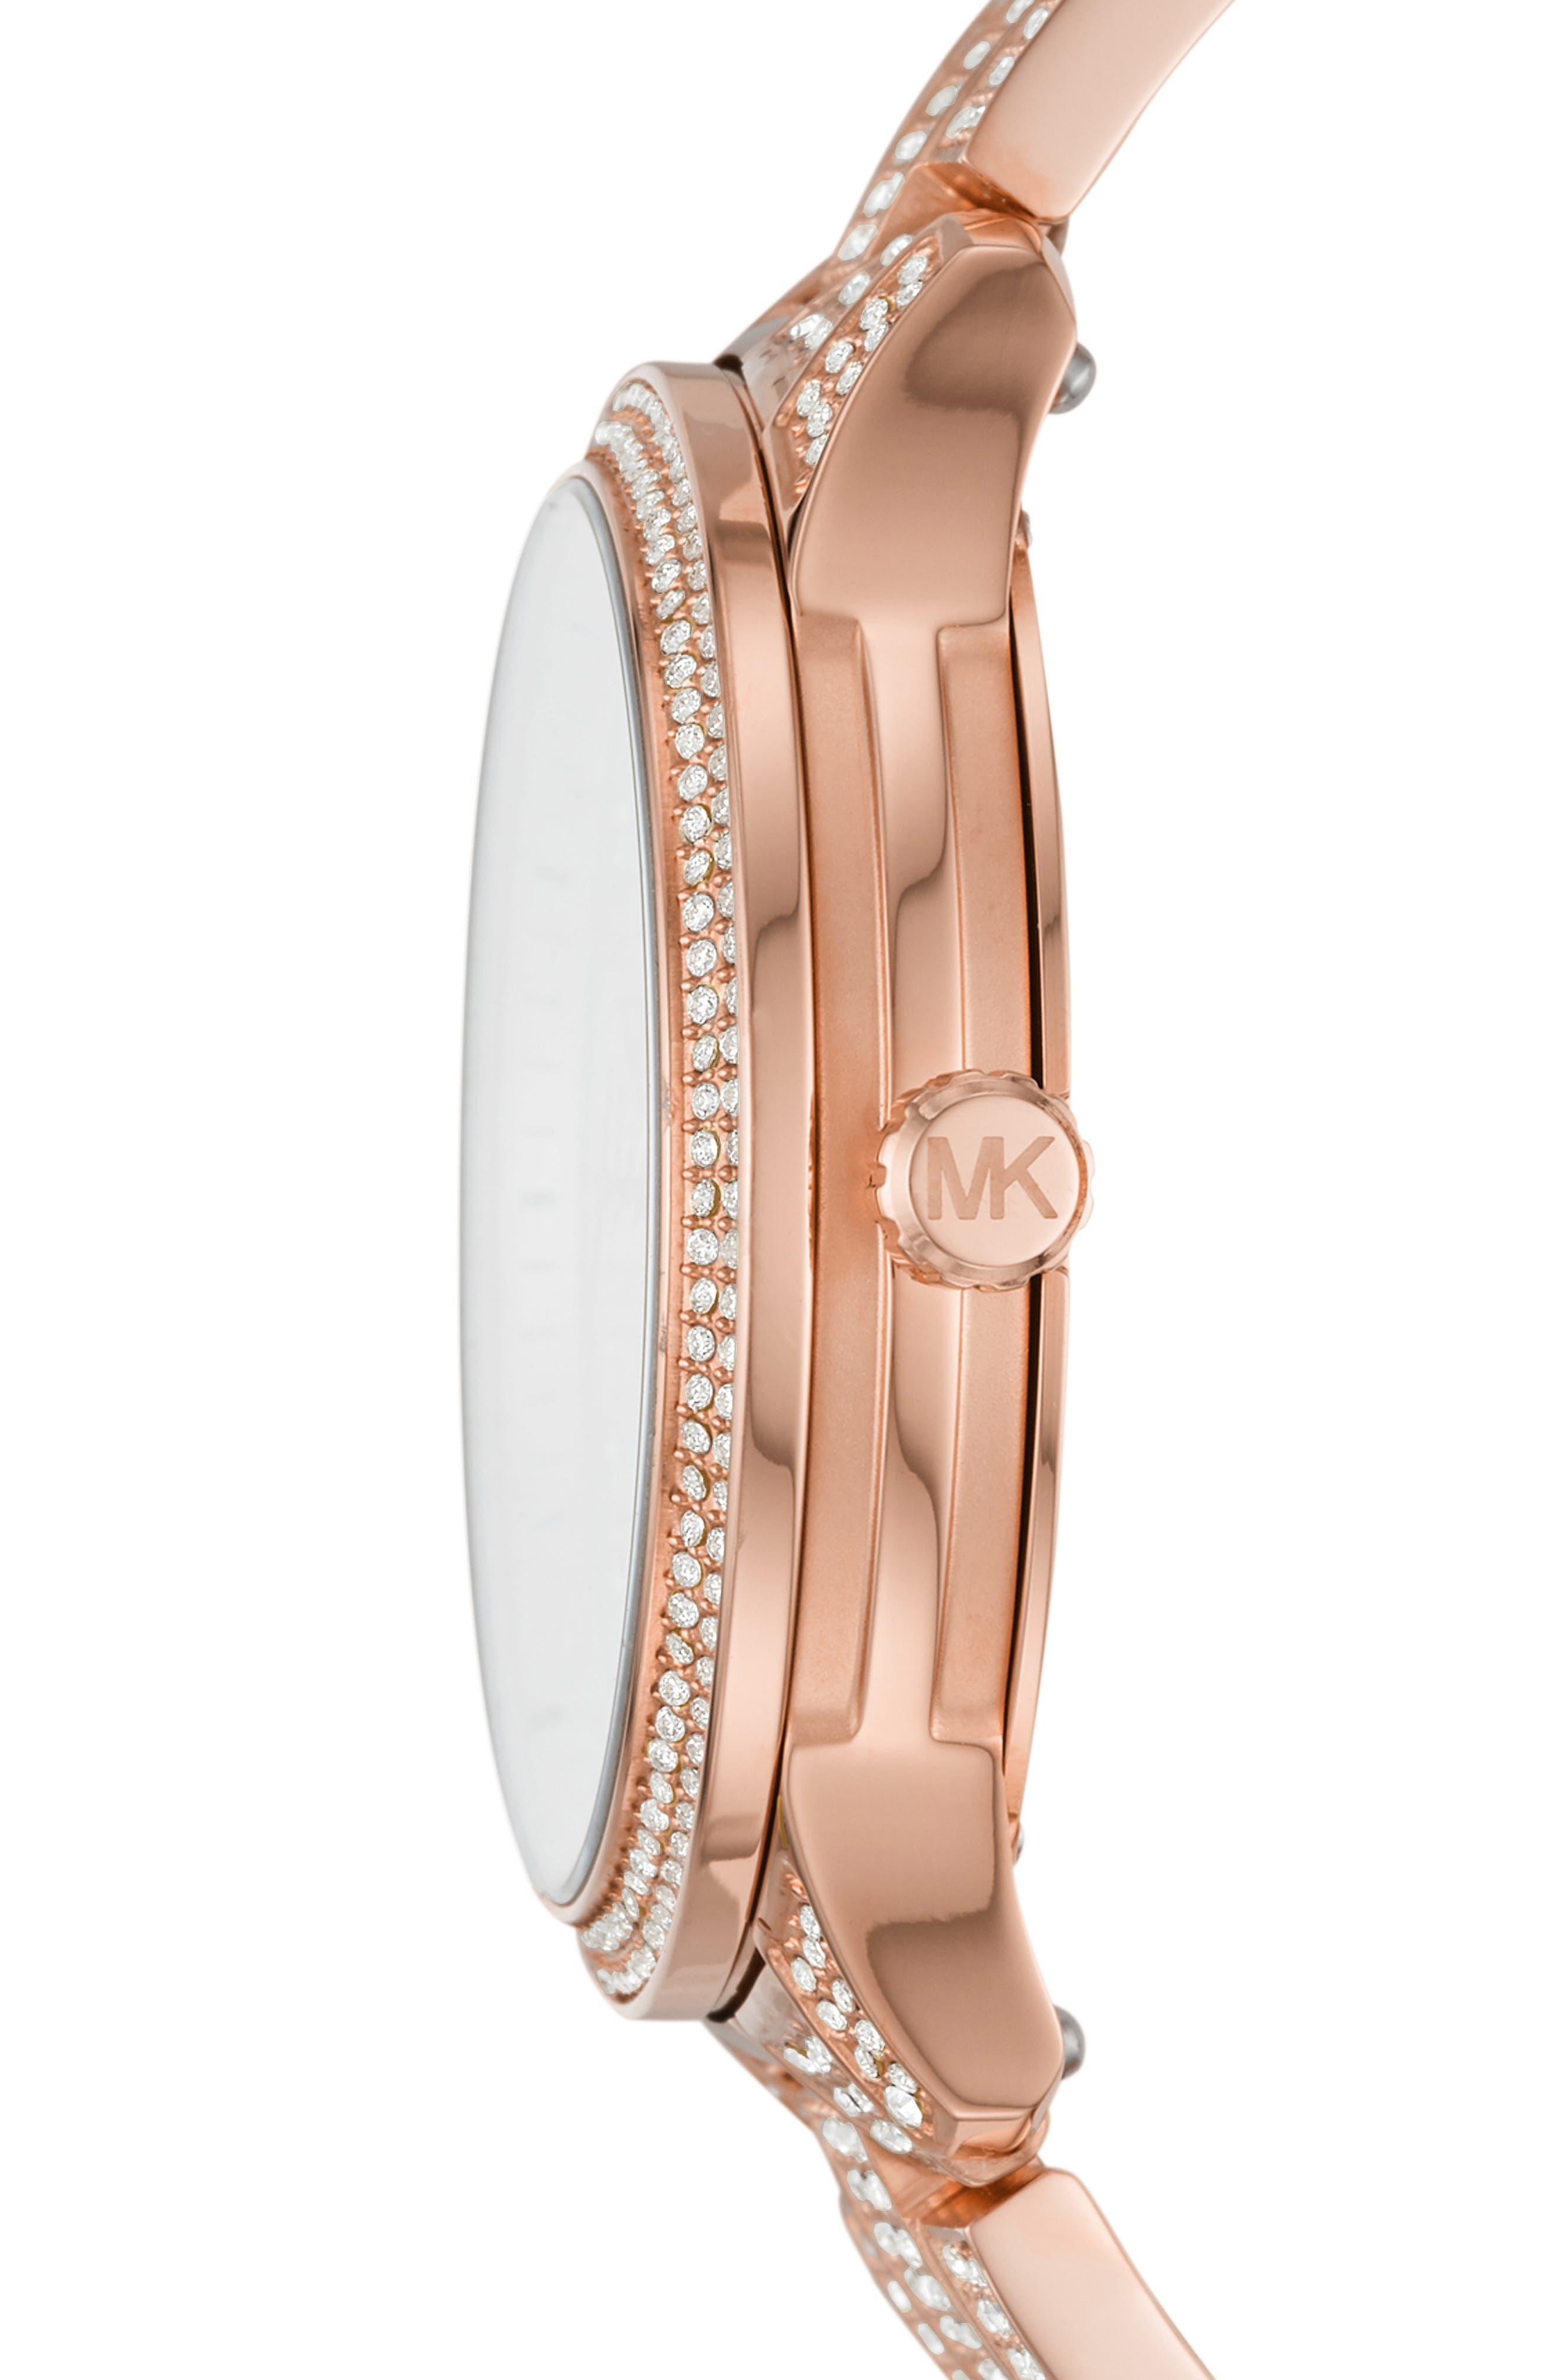 MICHAEL KORS,                             Runway Crystal Bracelet Watch, 38mm,                             Alternate thumbnail 2, color,                             ROSE GOLD